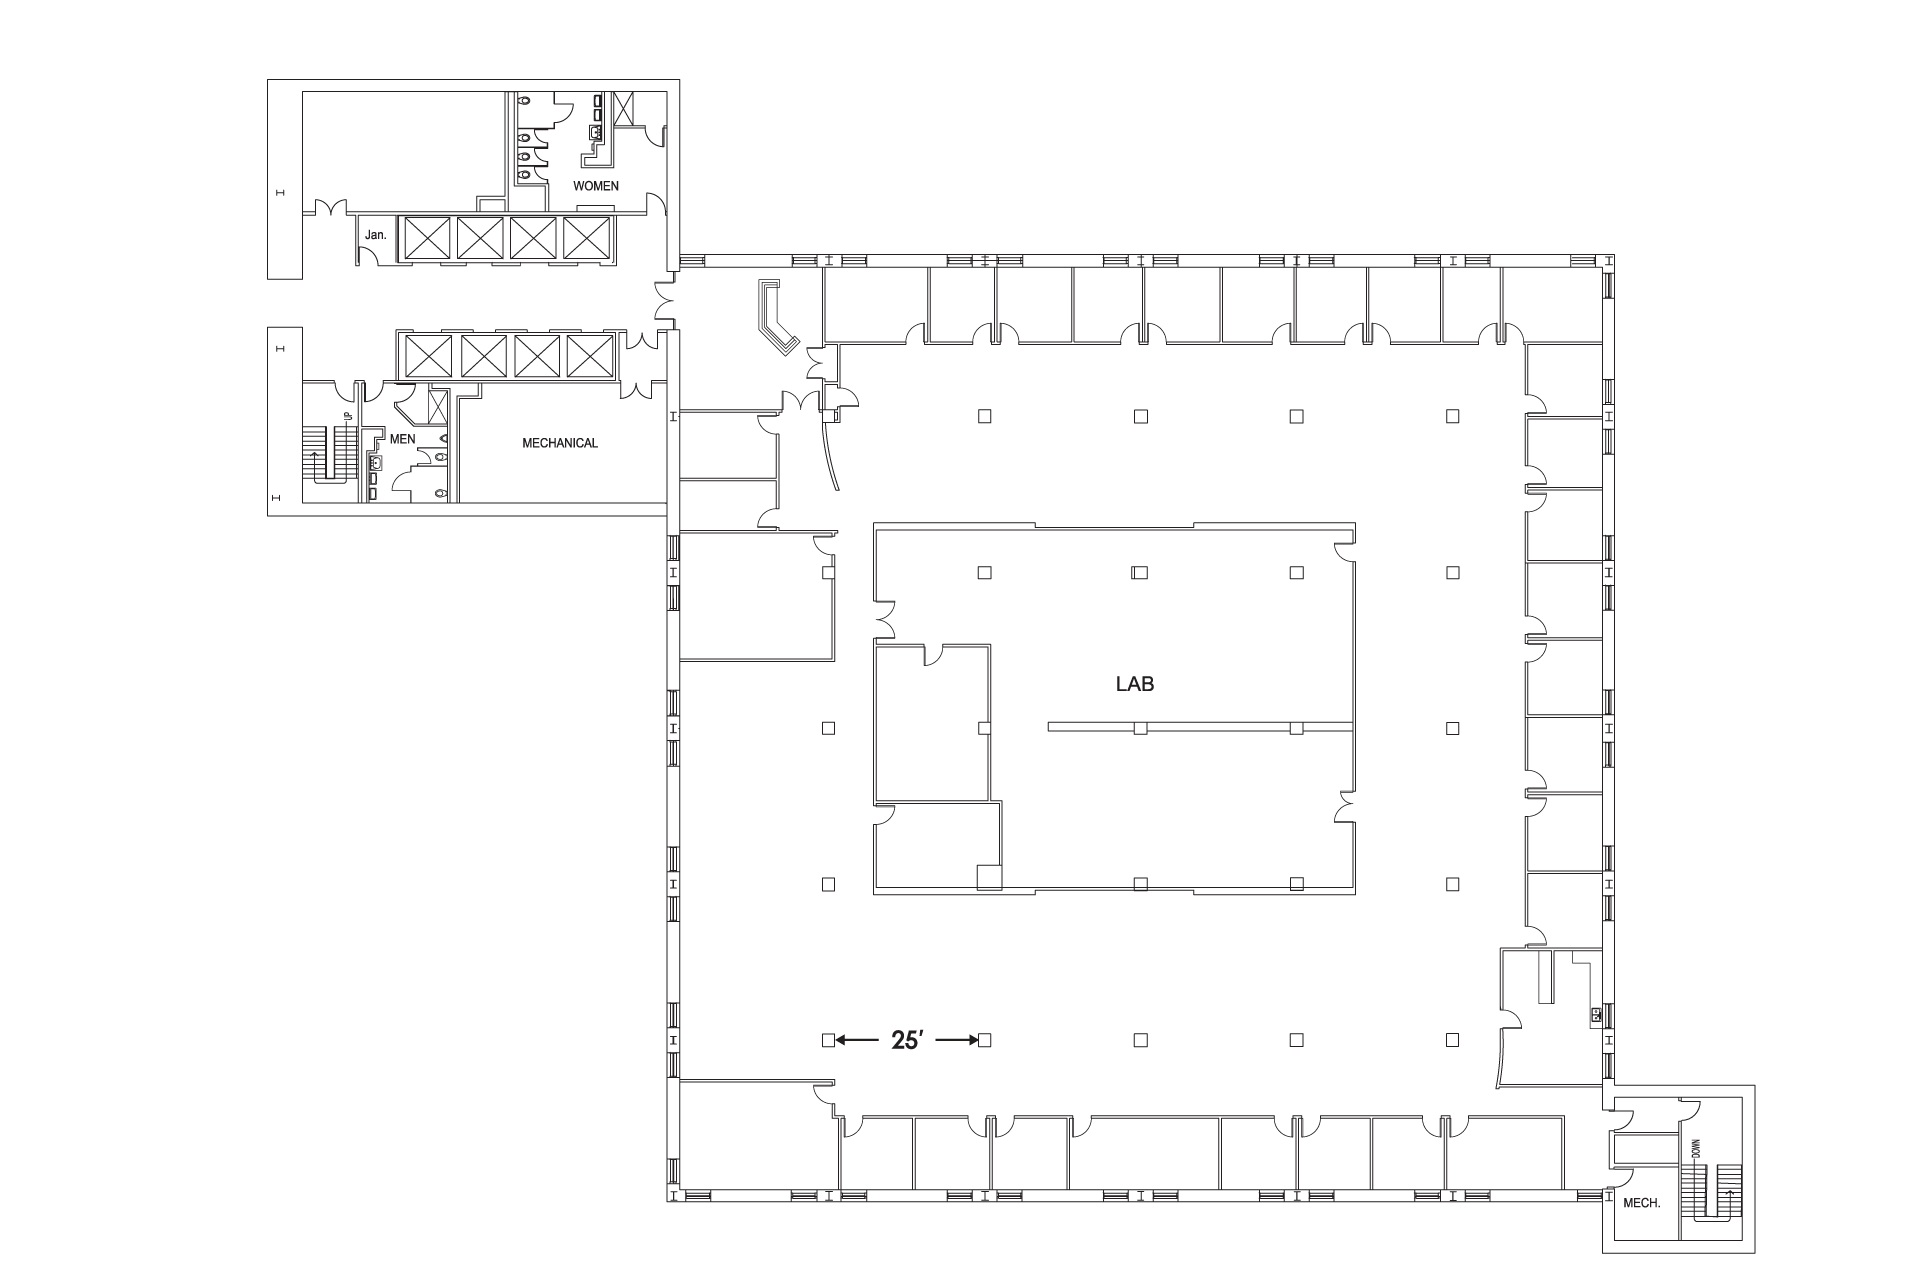 Tower 1 Floor 8 Floorplan Image